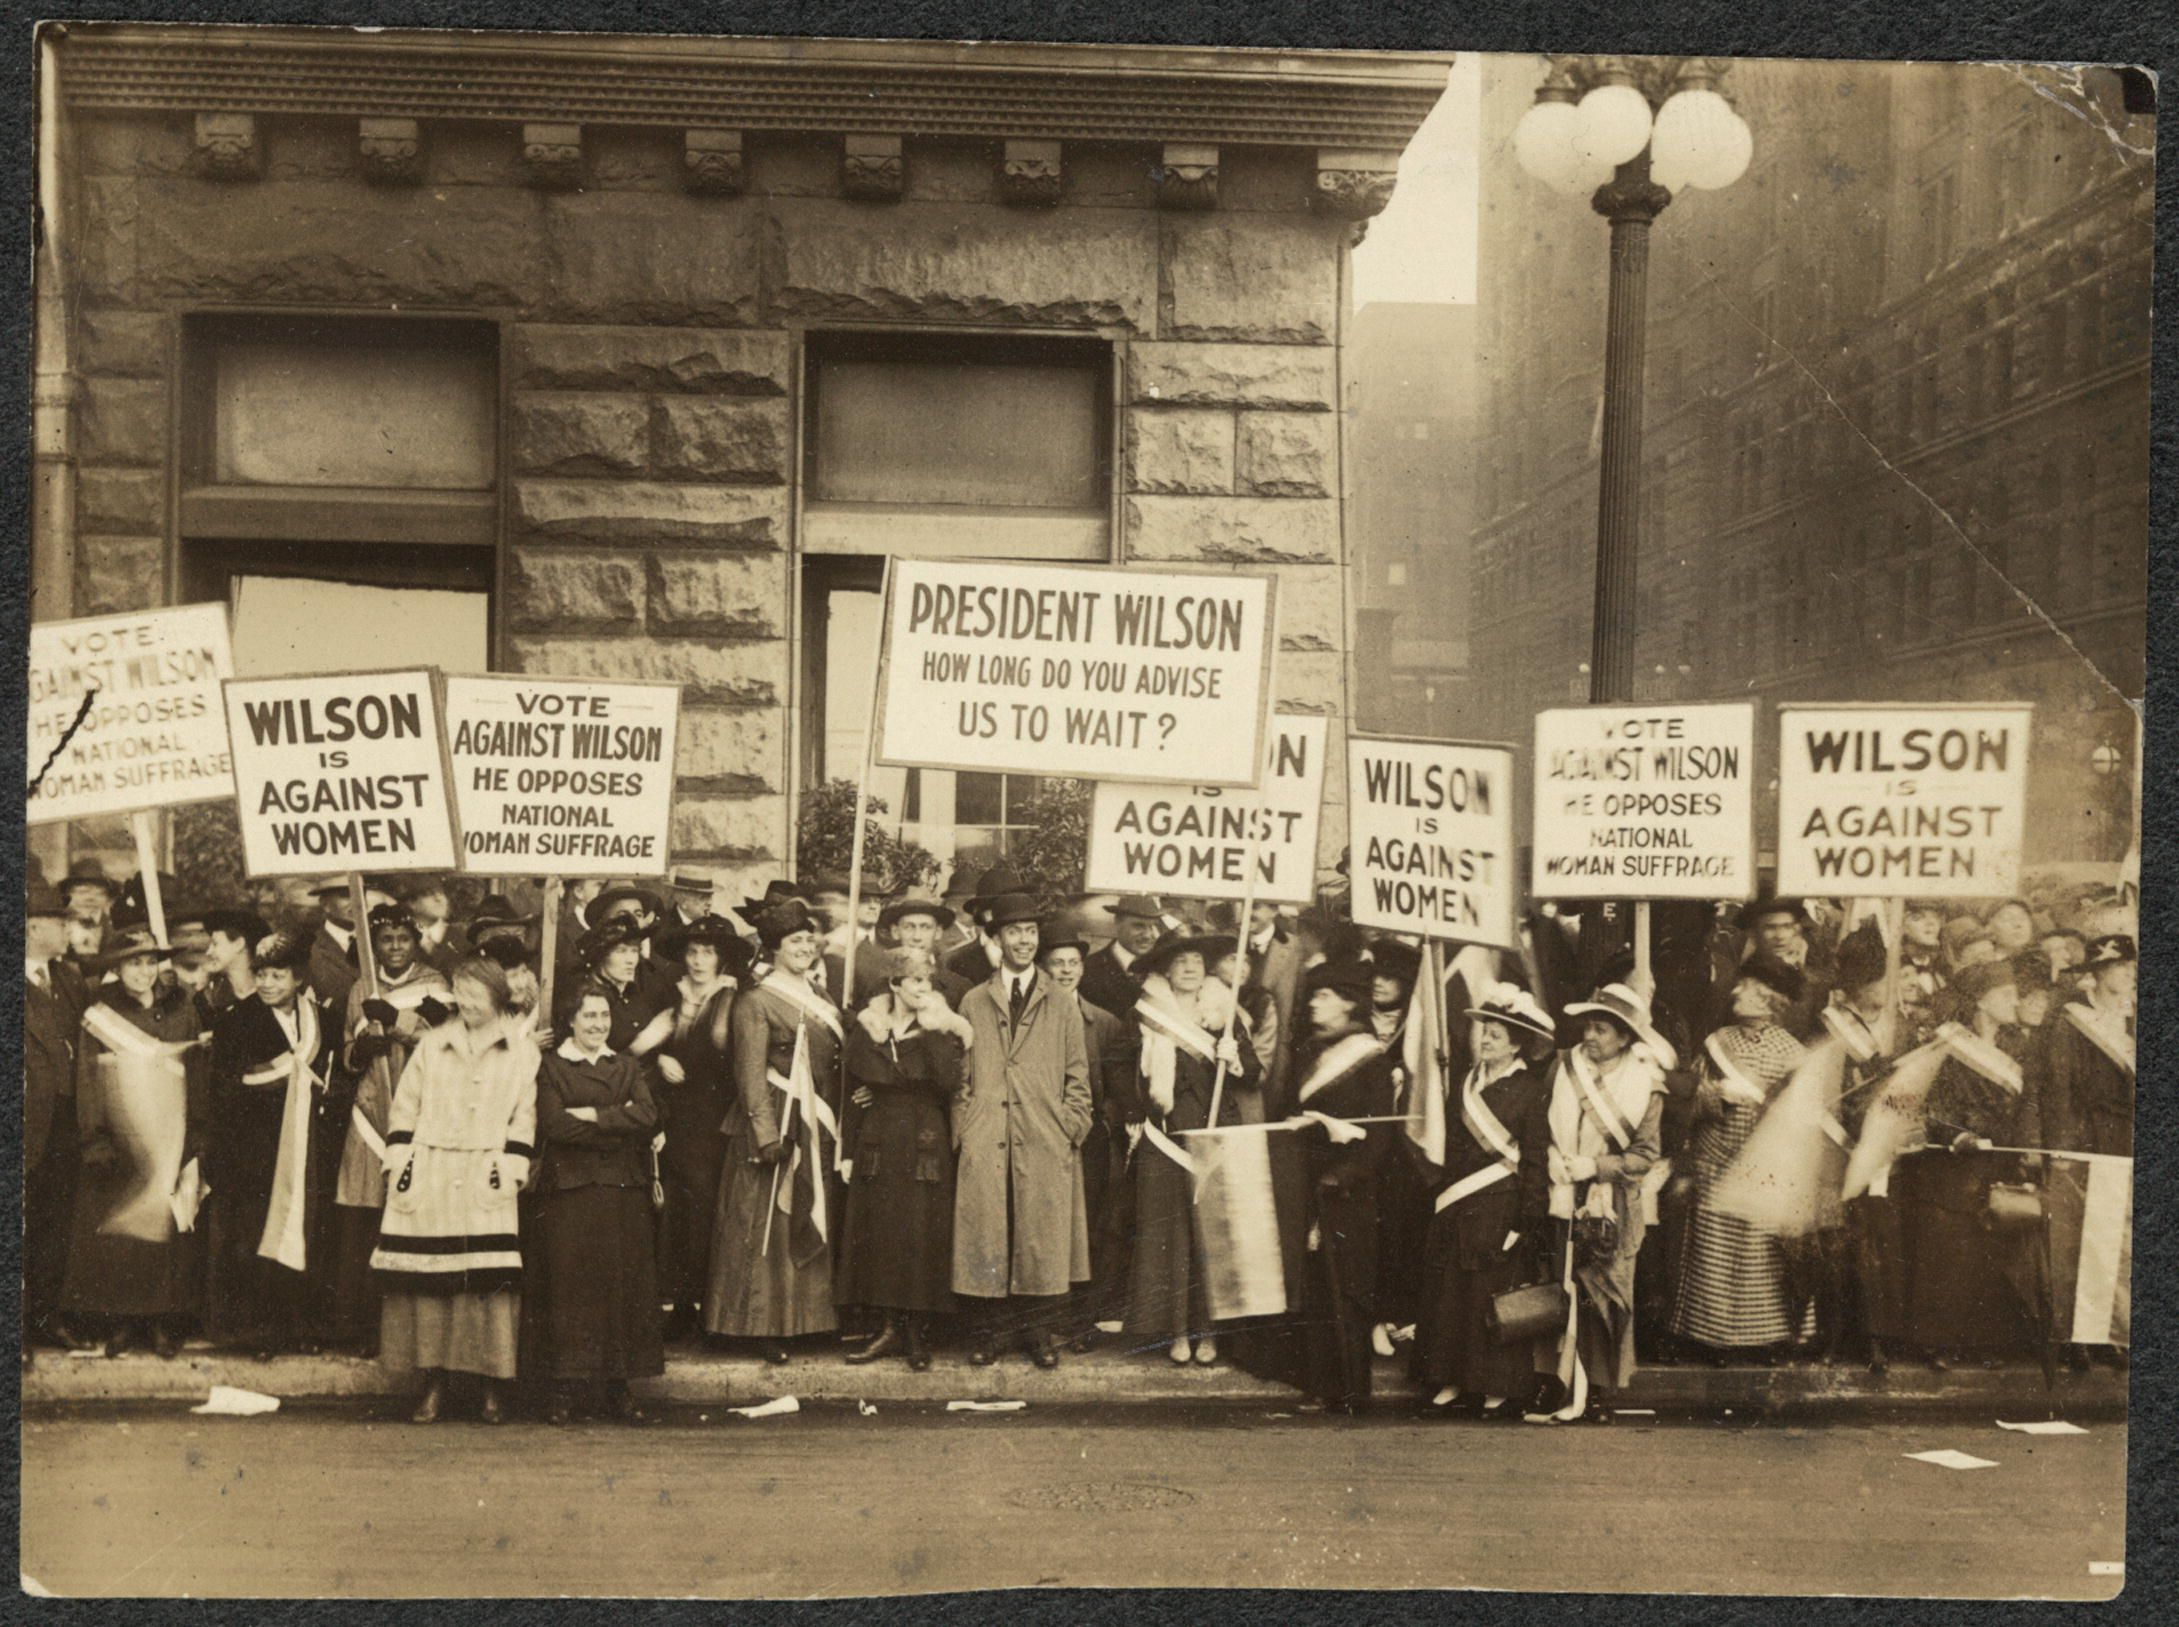 Good Girls Finish Last Http Jessbennett Tumblr Com Post 34993594224 Women Of Protest A Feminist History Refresher Heroe Hiperbola Imagenes